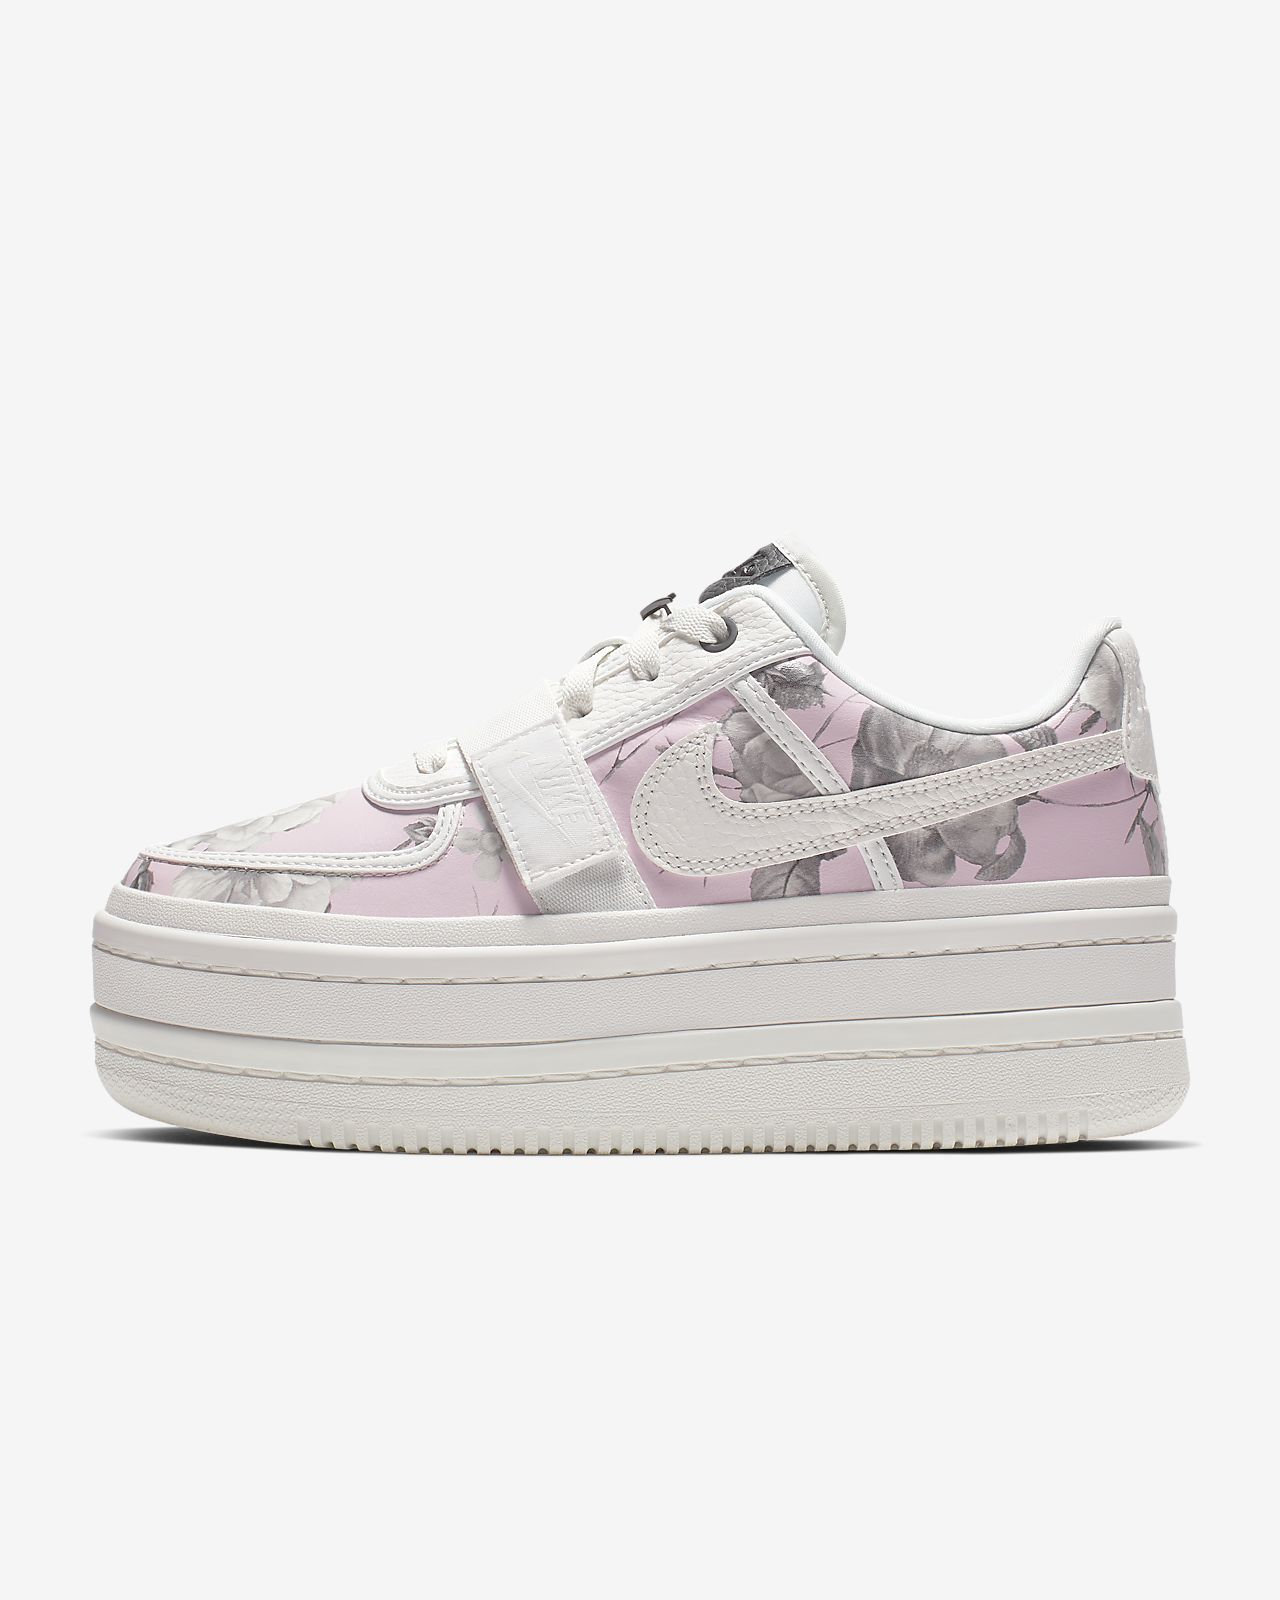 Nike Vandal 2K LX Floral Women's Shoe